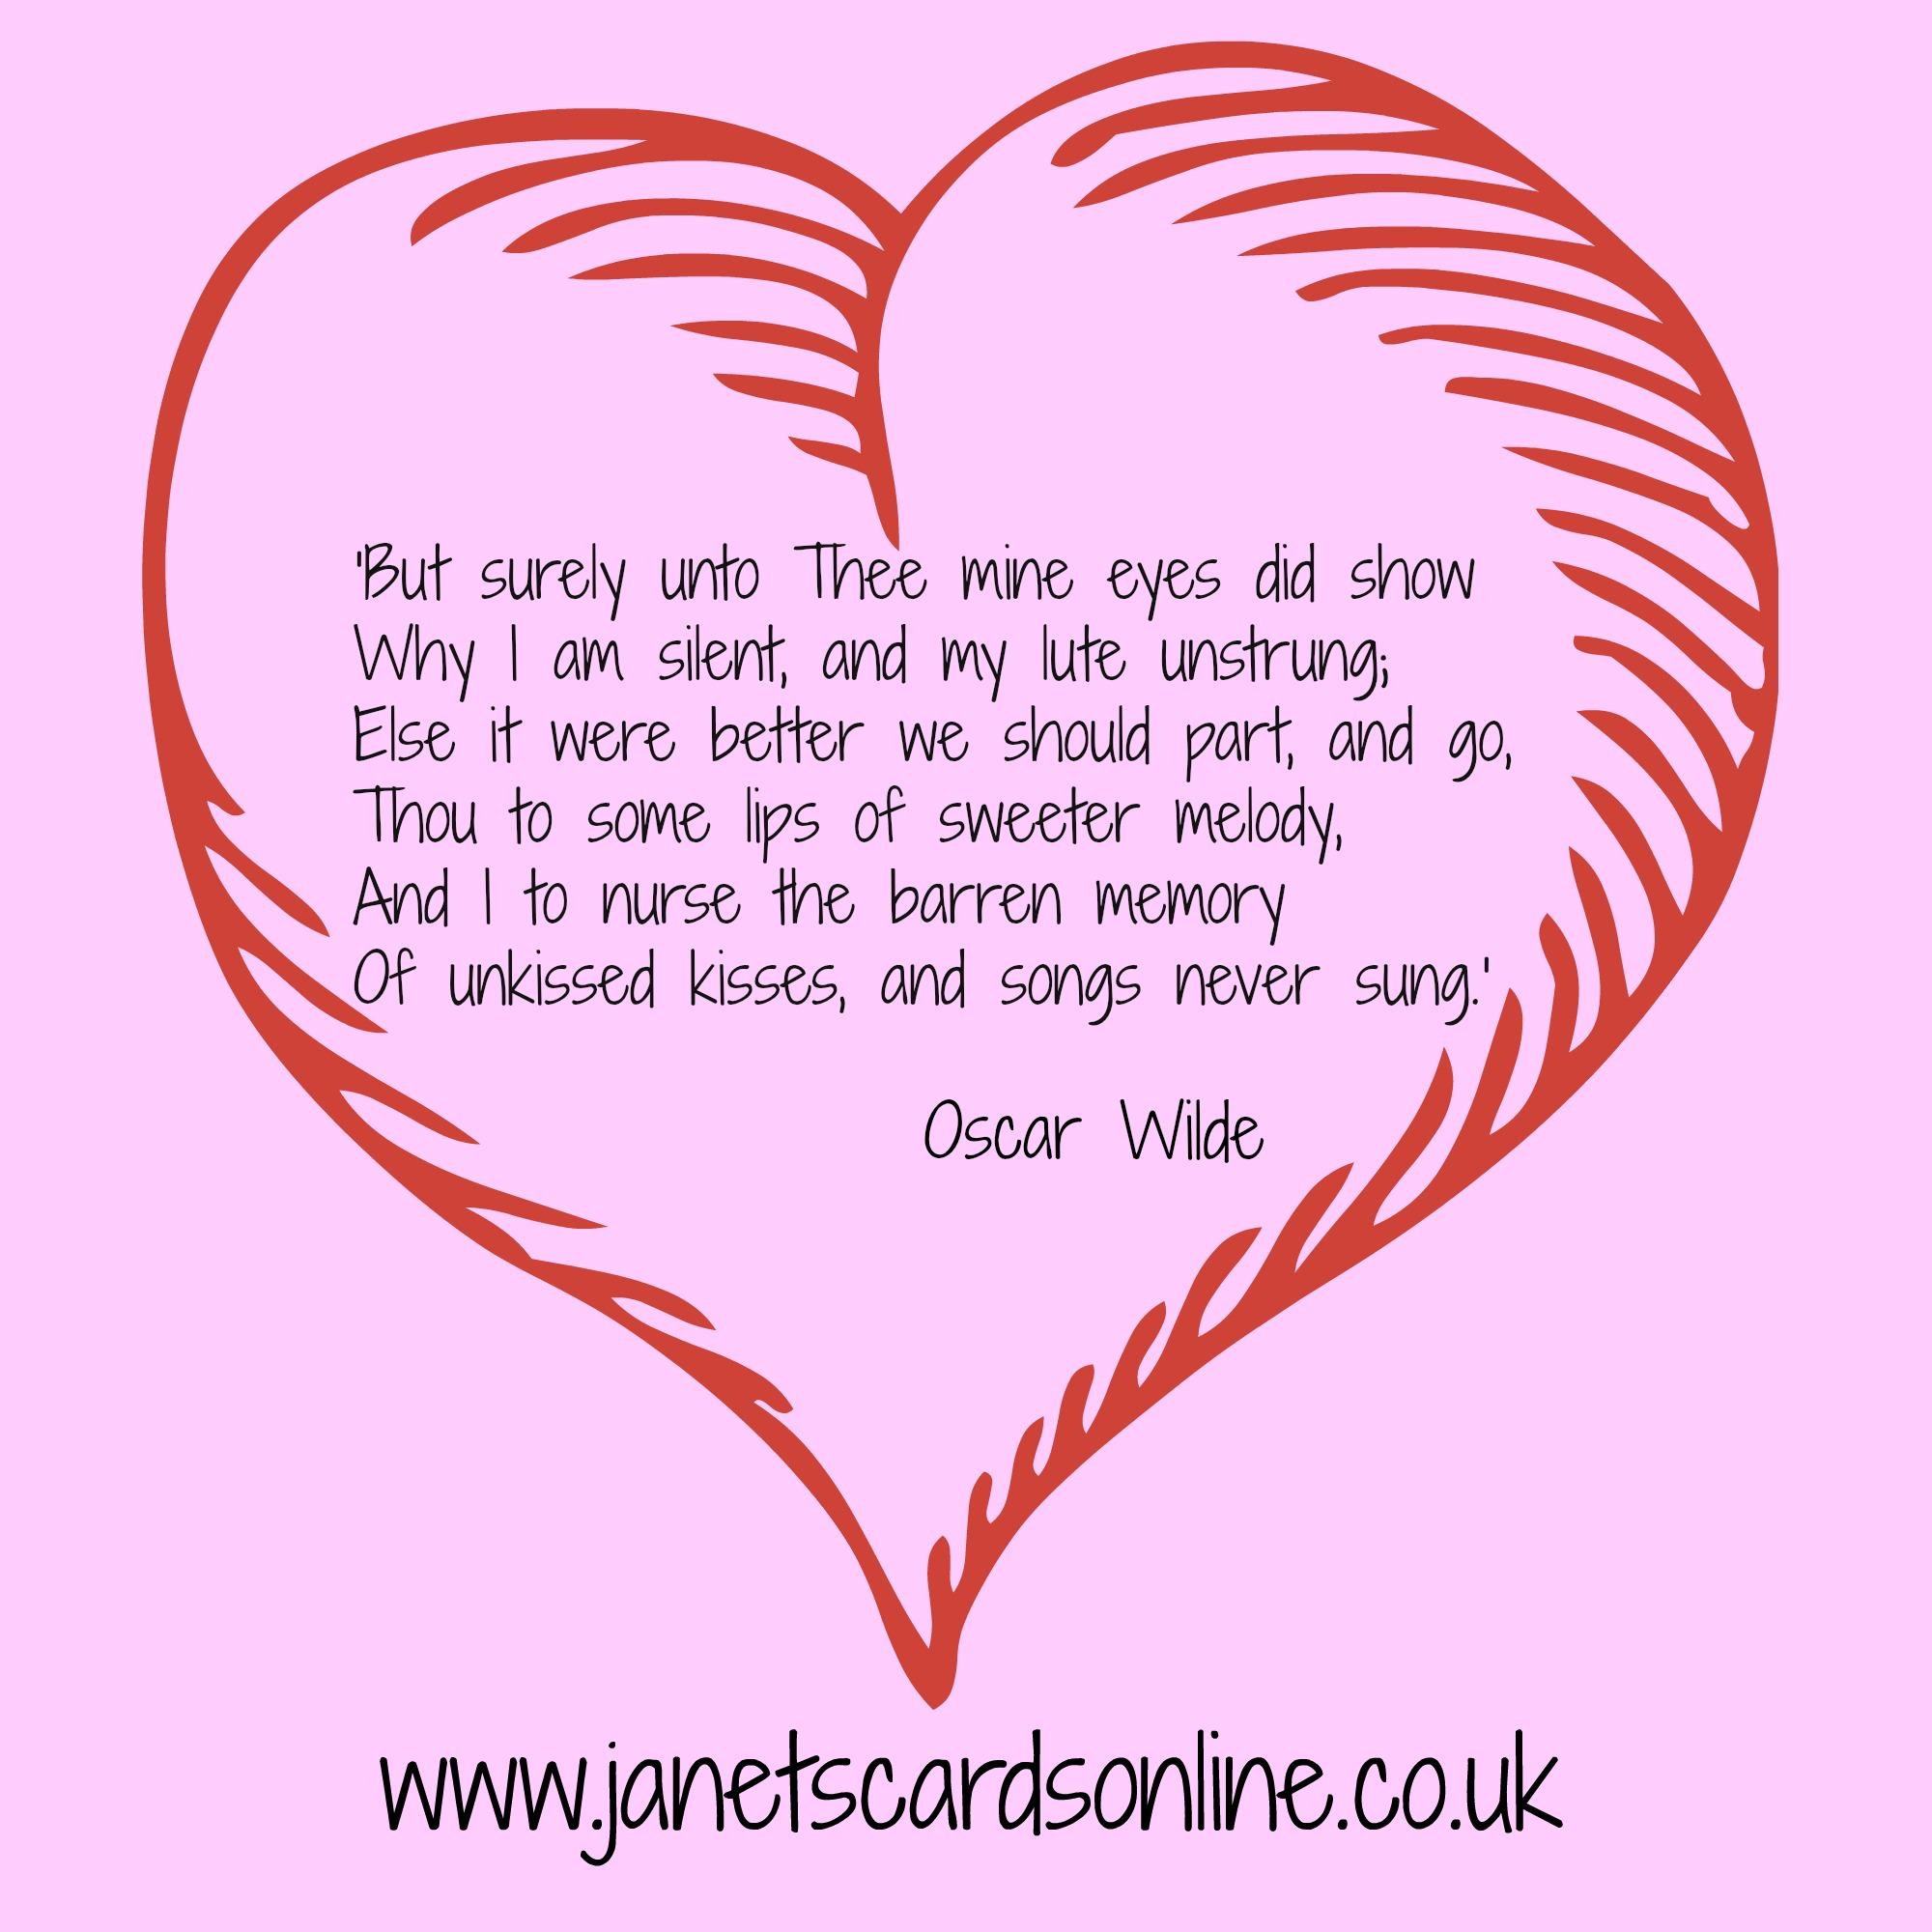 oscar wilde love poem valentines day quote